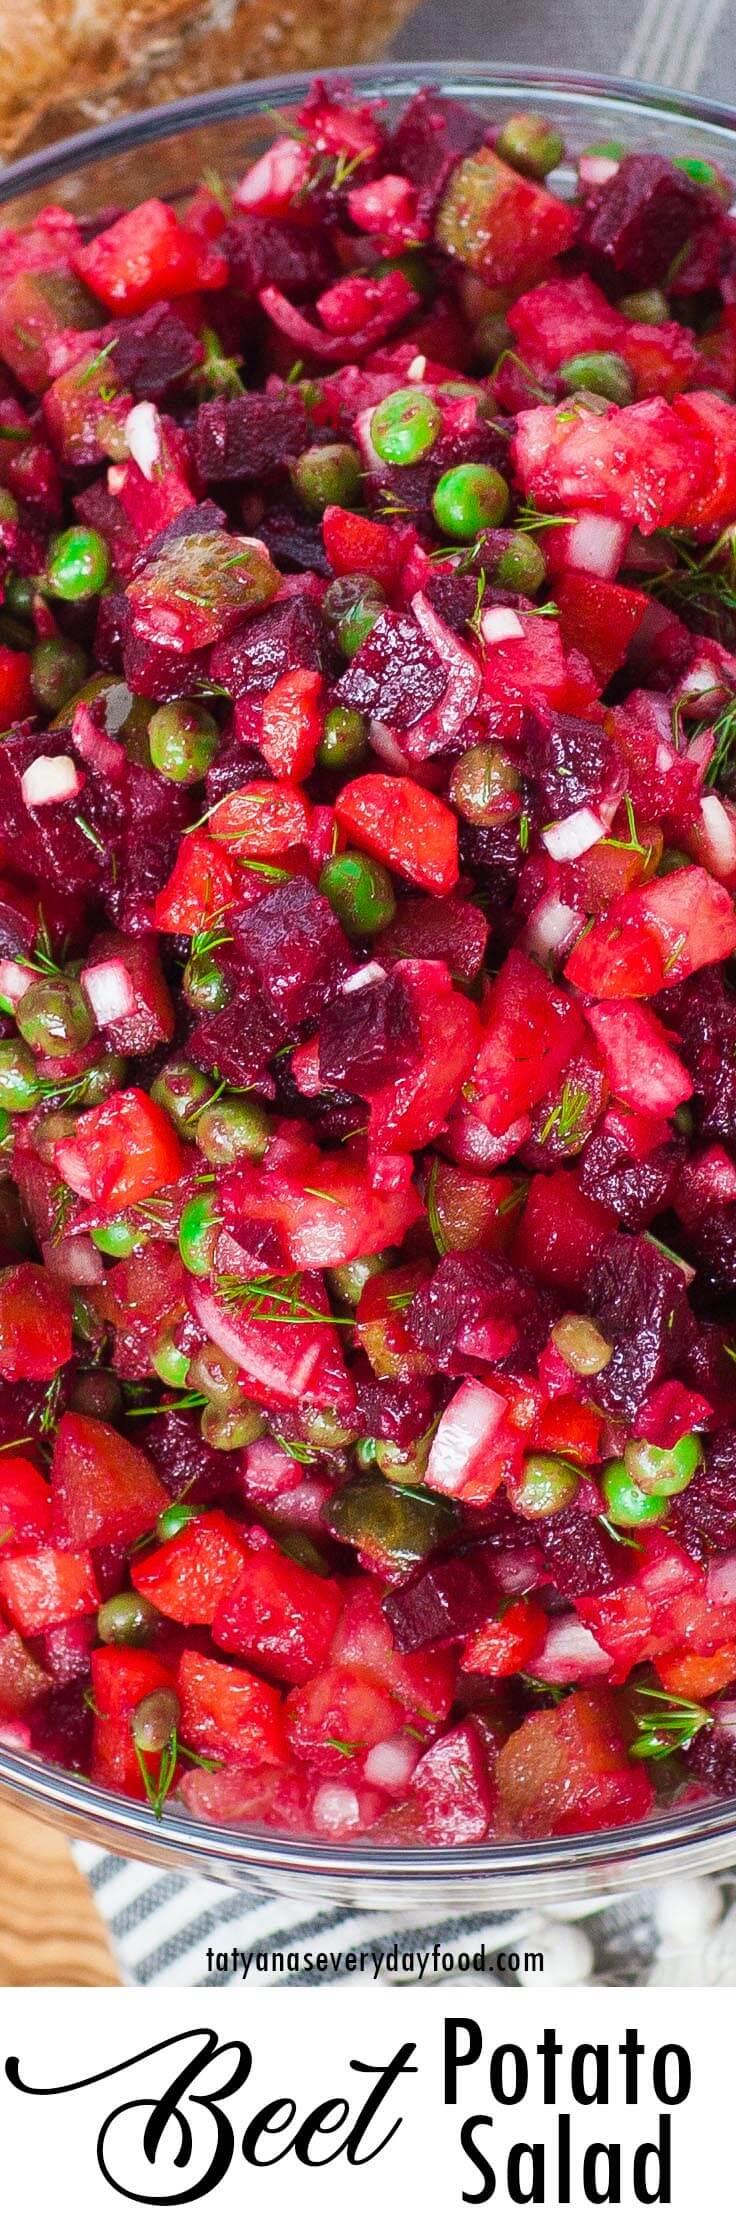 Beet Potato Salad video recipe